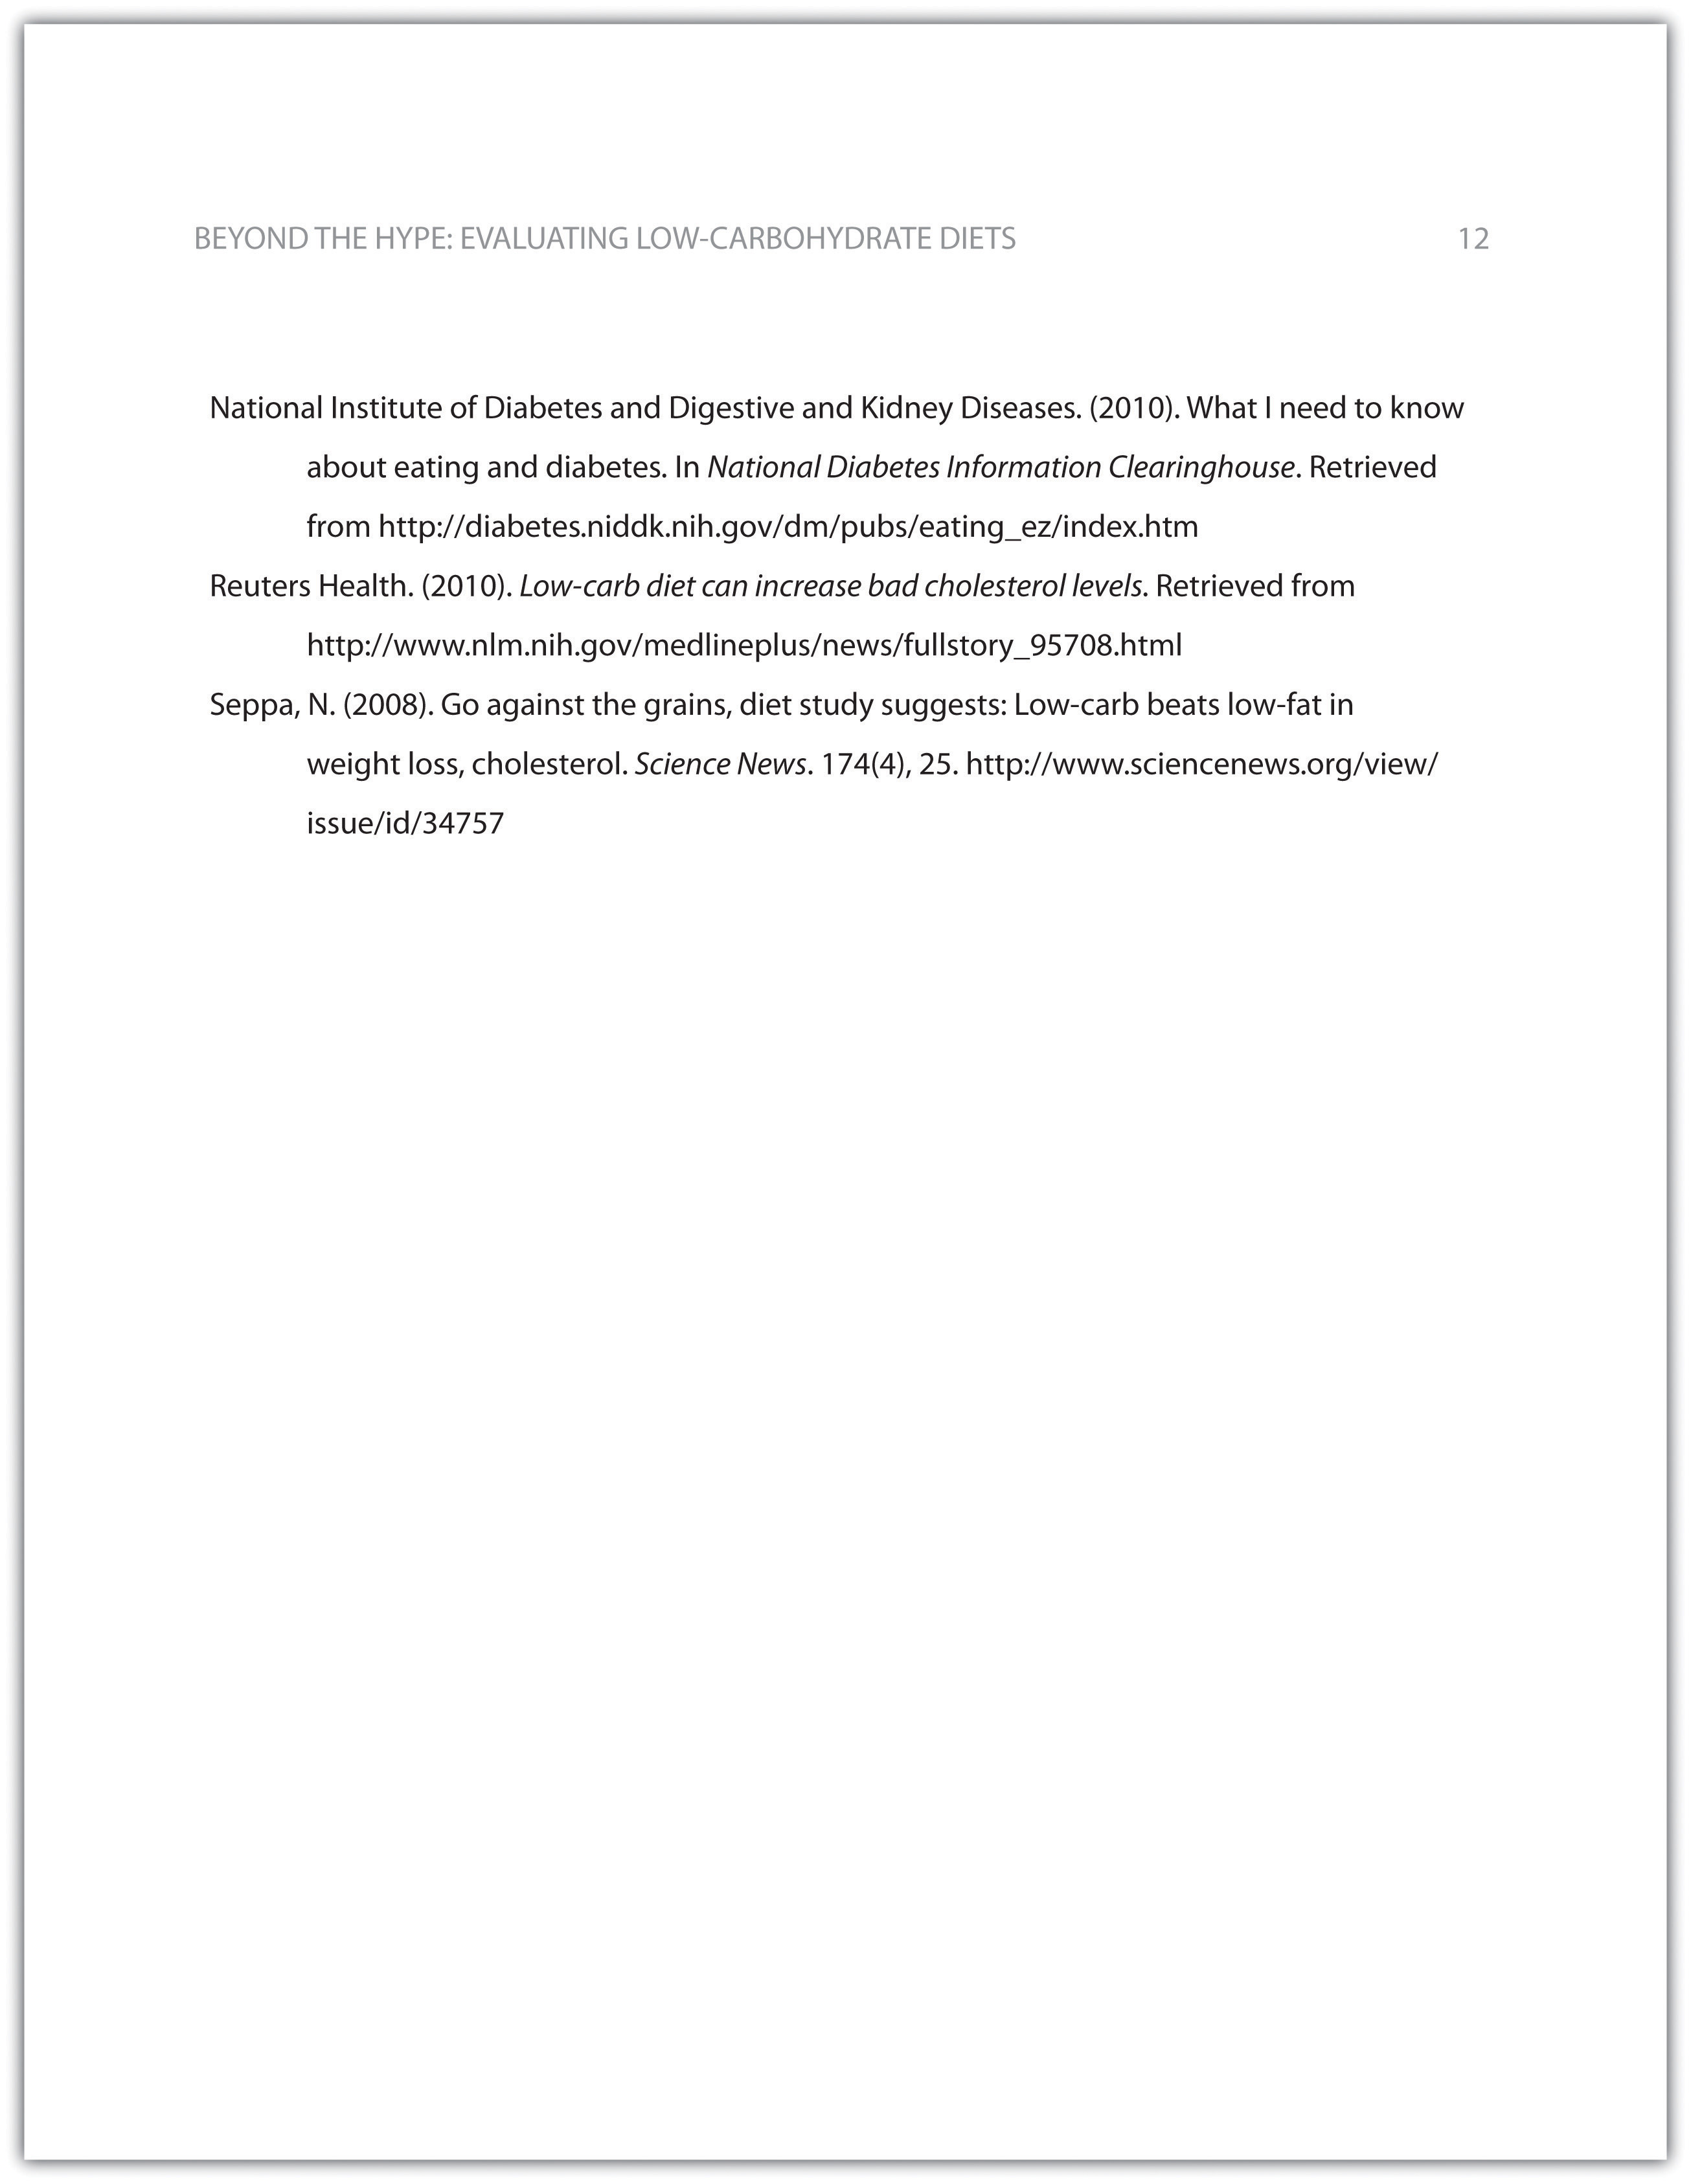 Ama Essay Format Chhattisgarh Board Class 12 Political Science